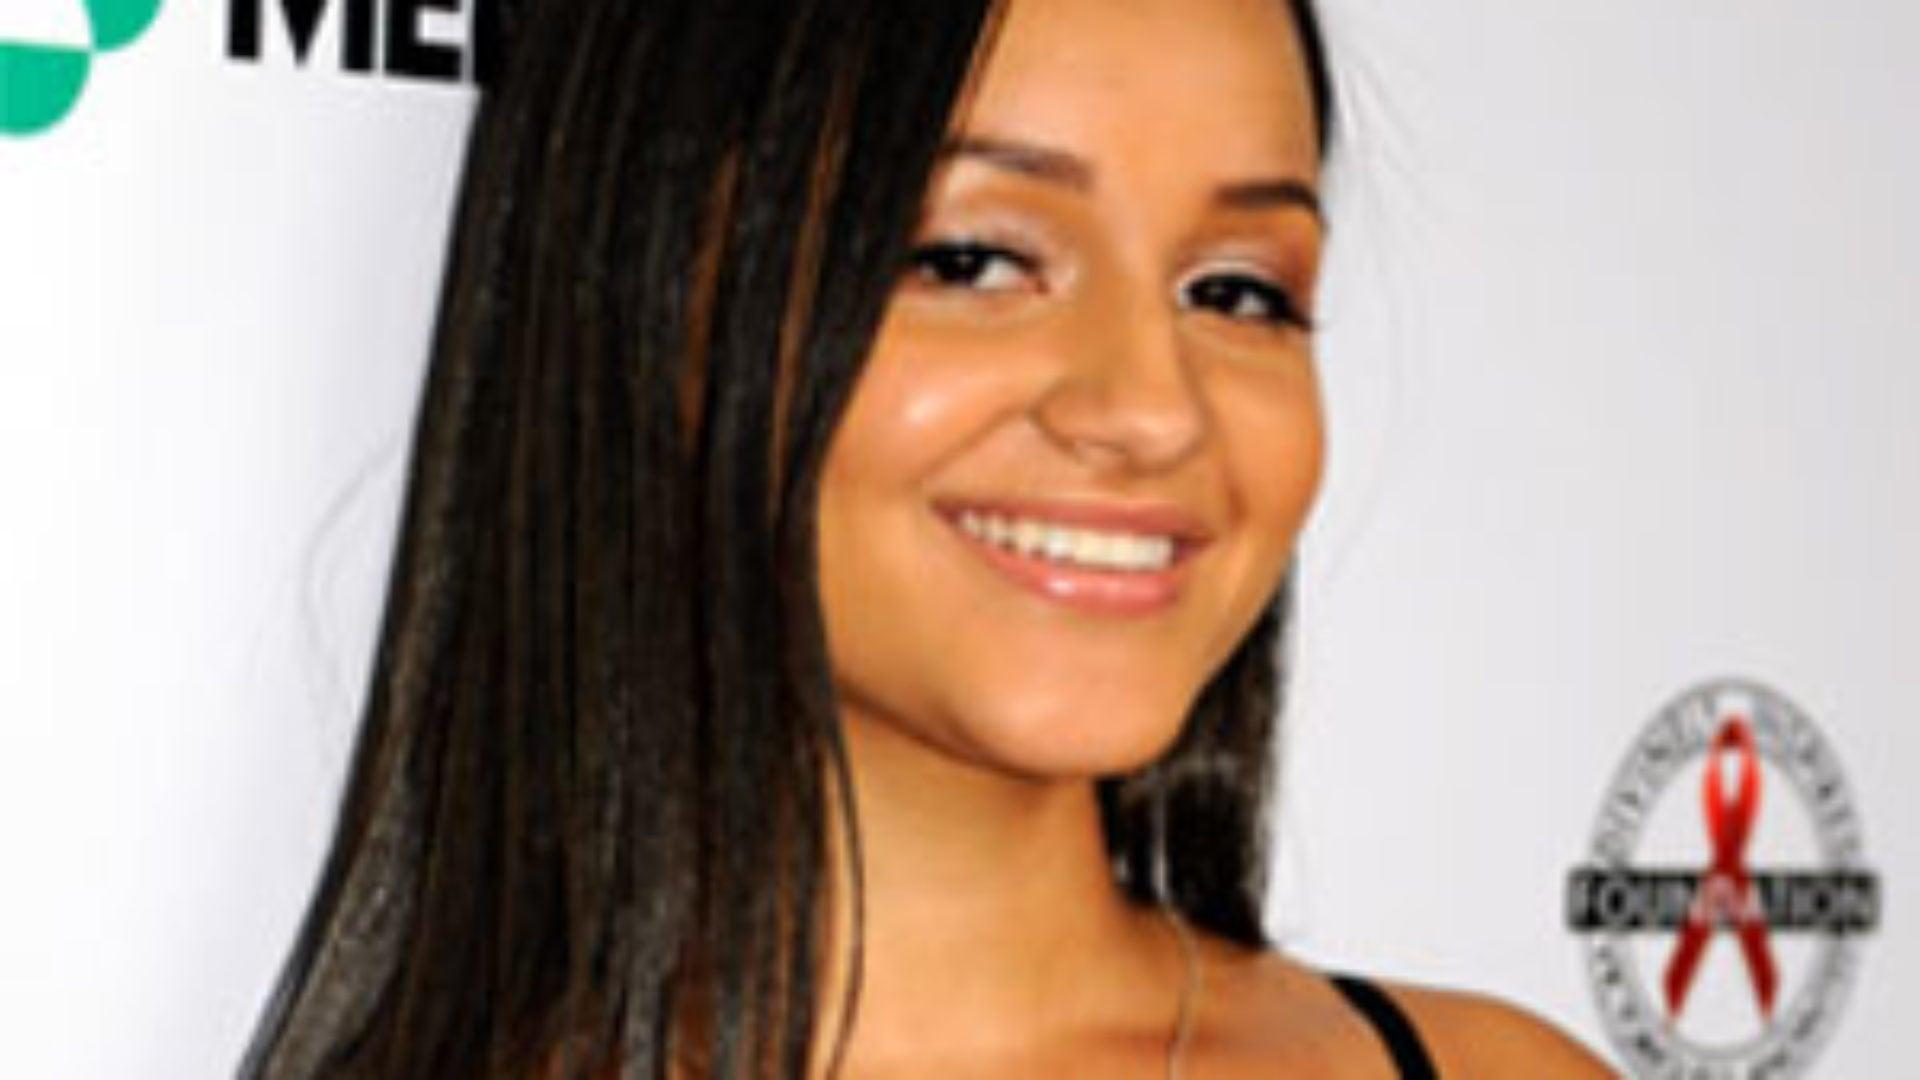 Exclusive: Teena Marie's Daughter on Mother's Death